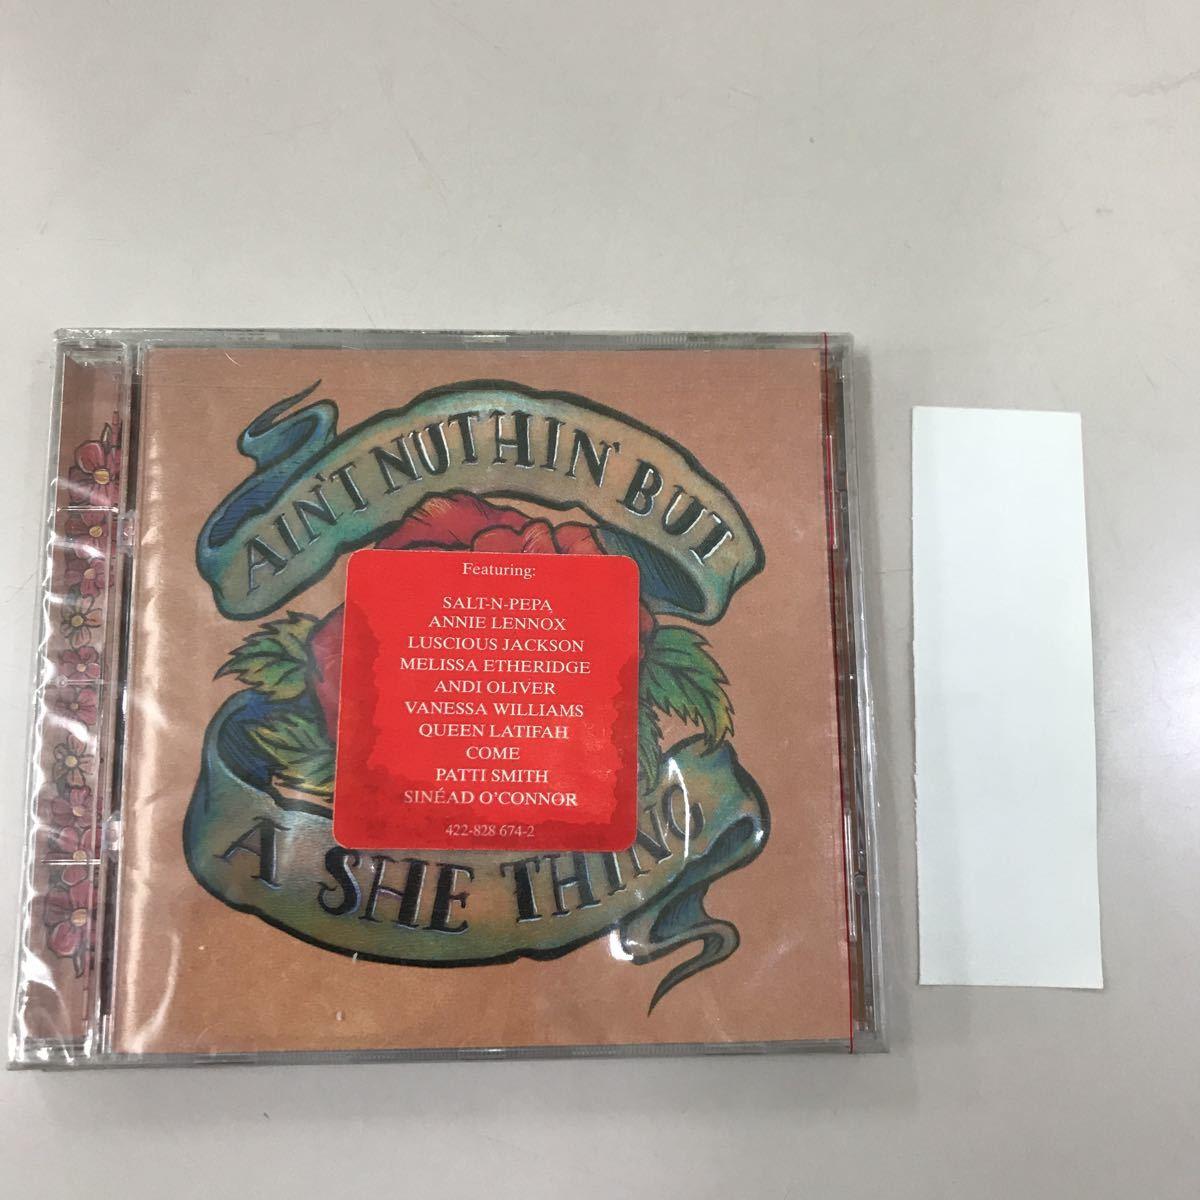 CD 輸入盤未開封【洋楽】長期保存品 VARIOUS